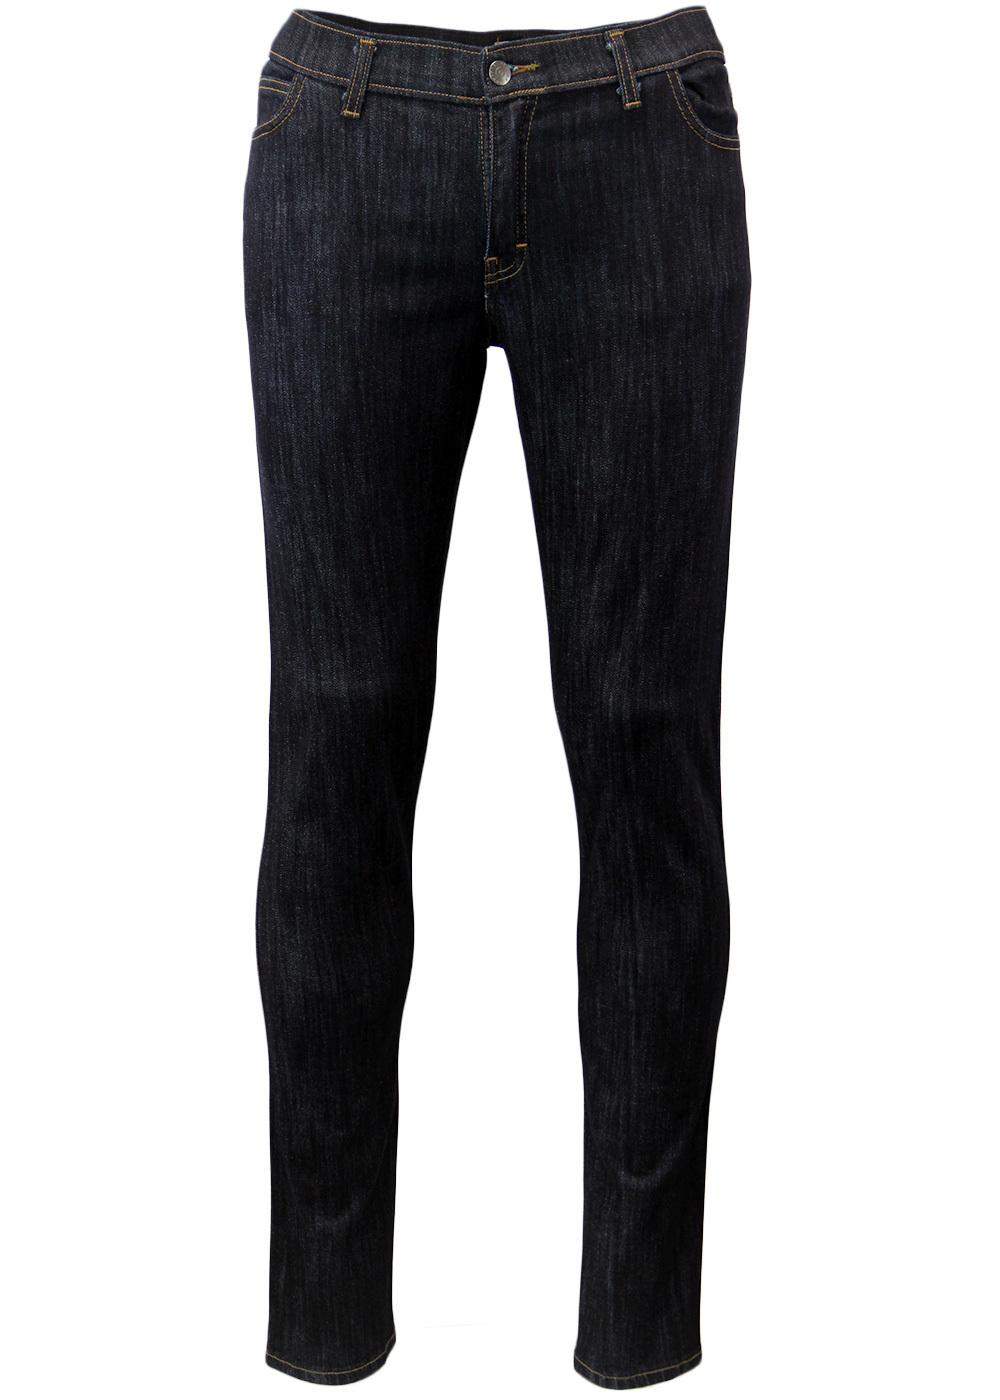 178482f4 Draytone Drainpipe Jeans | MADCAP ENGLAND Retro Mod Skinny Jeans